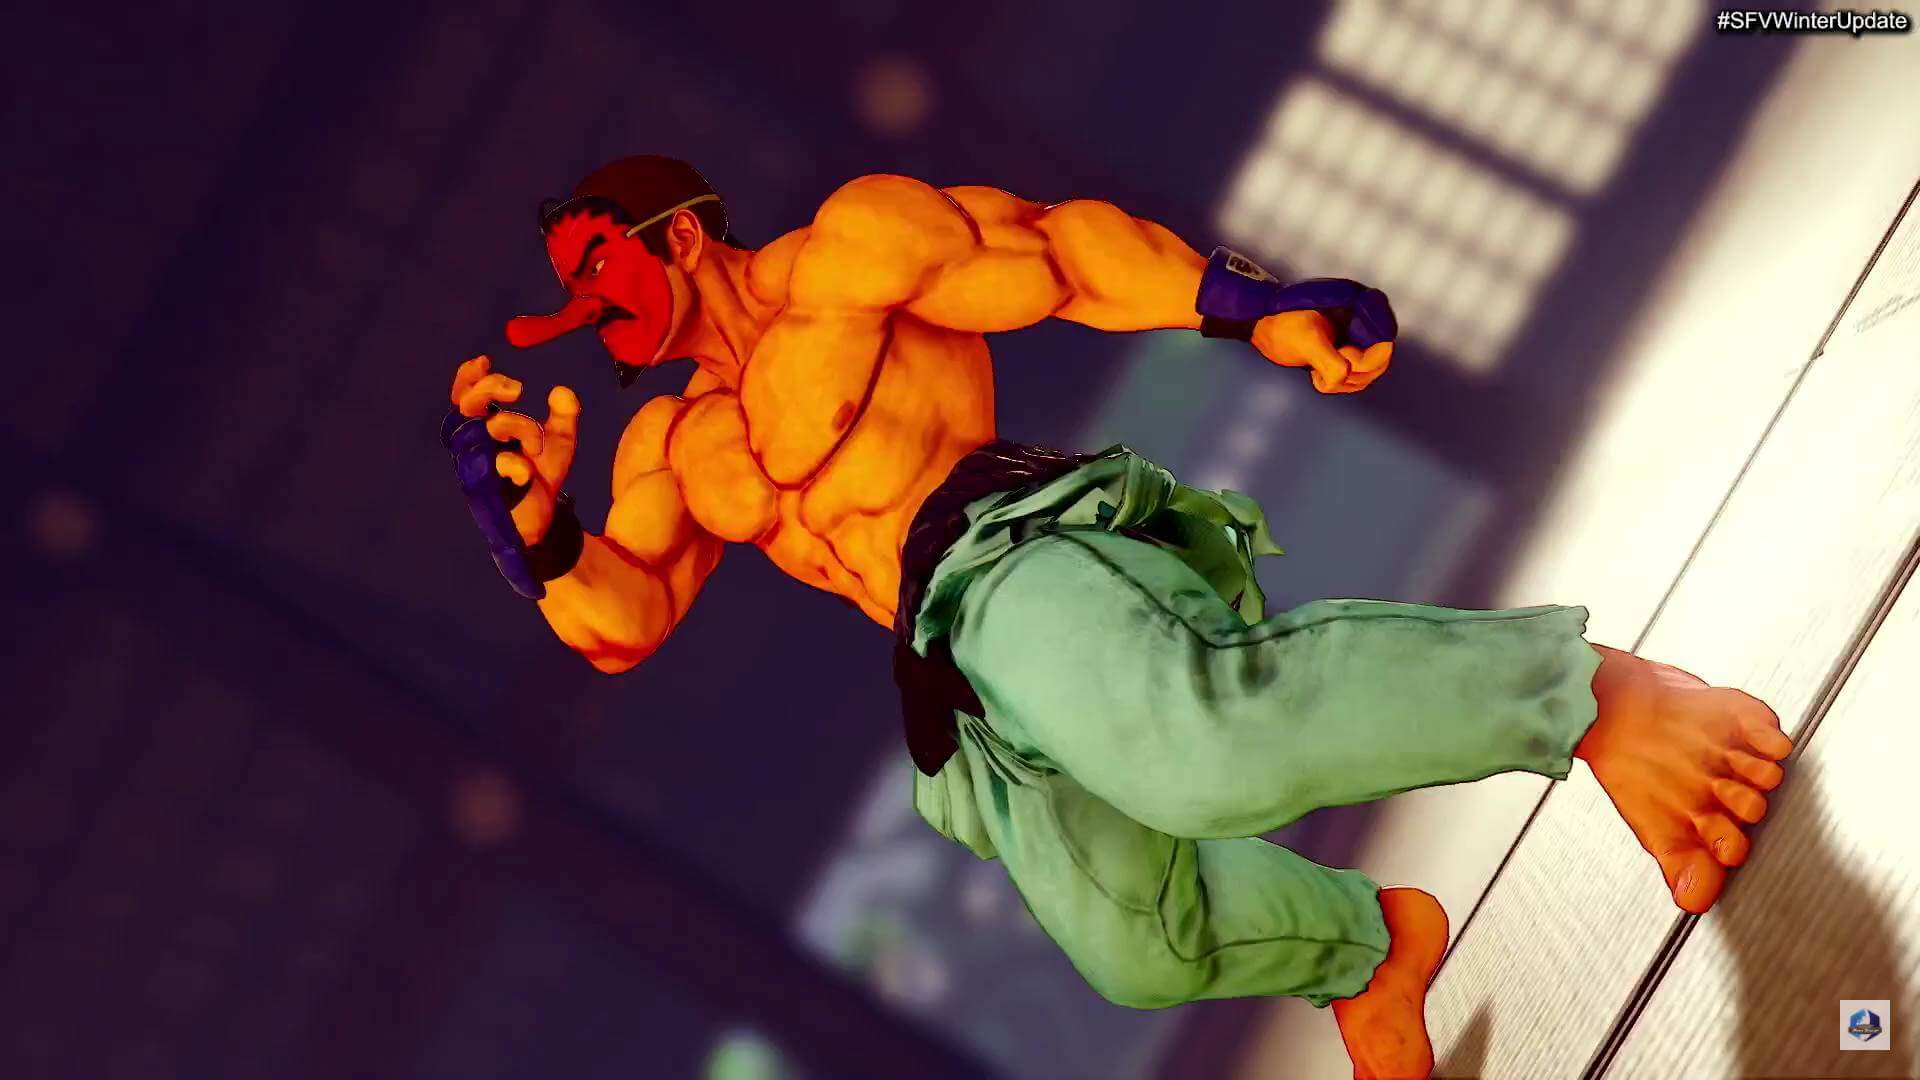 Street Fighter 5 Winter Update - battle costume of Dan Hibiki